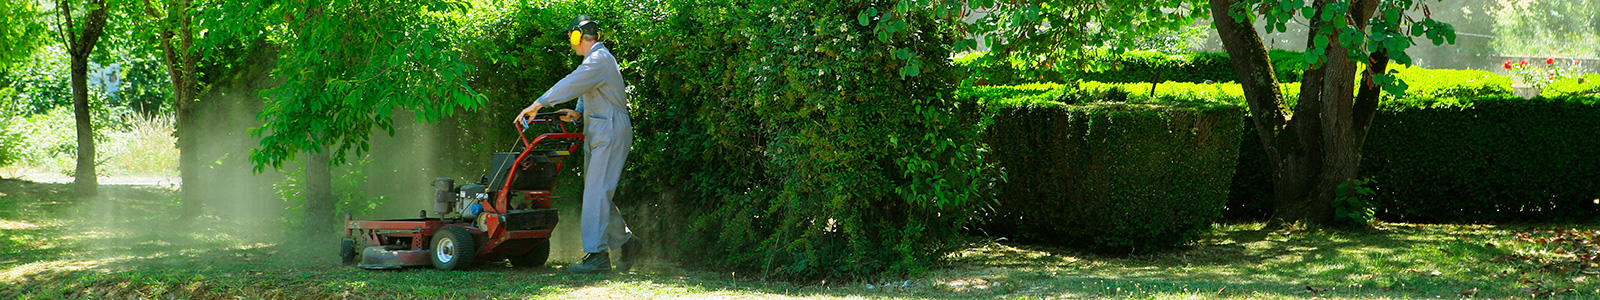 Espace verts